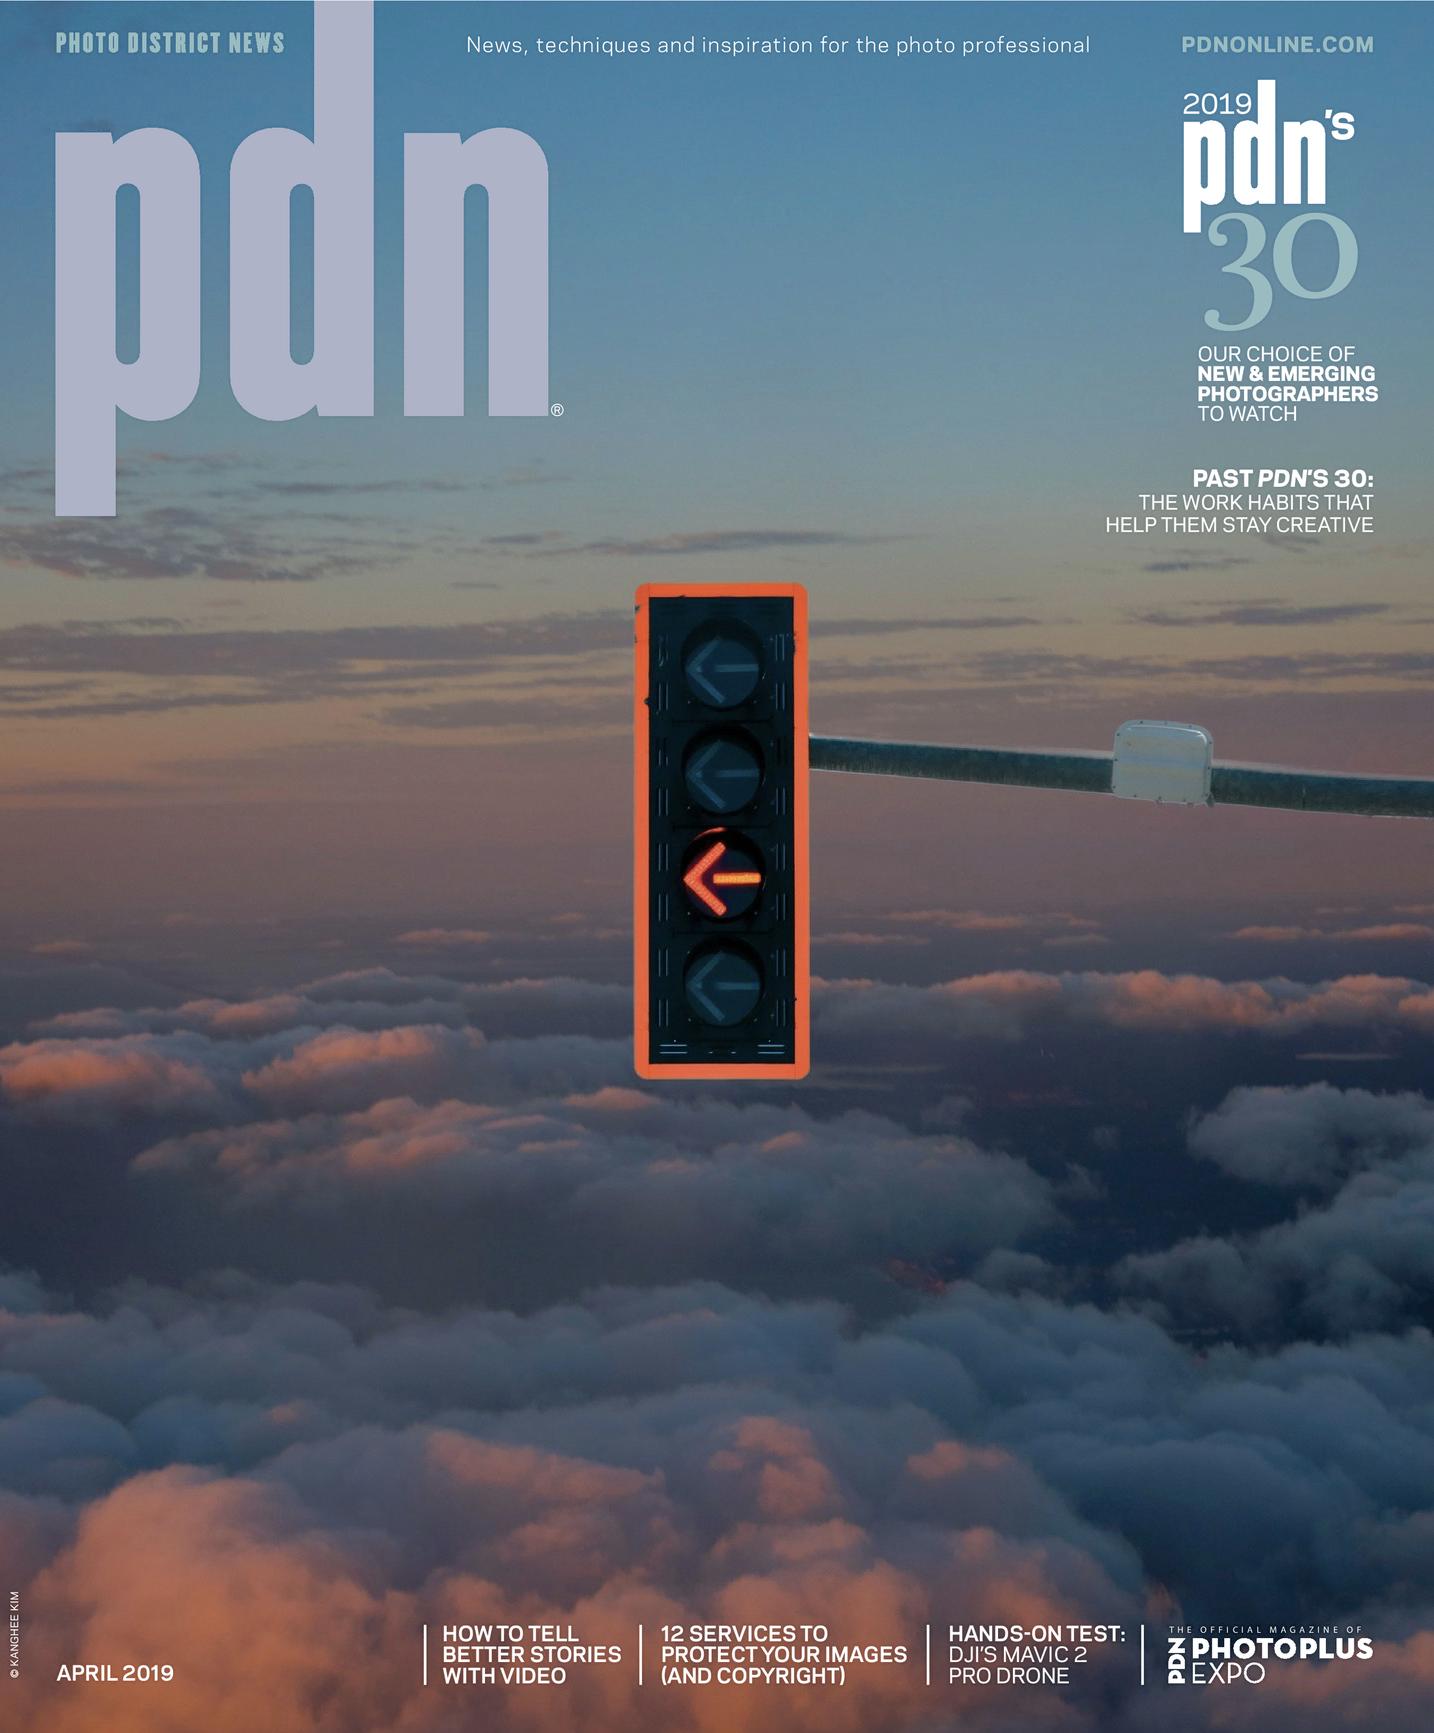 PDN April 2019.png